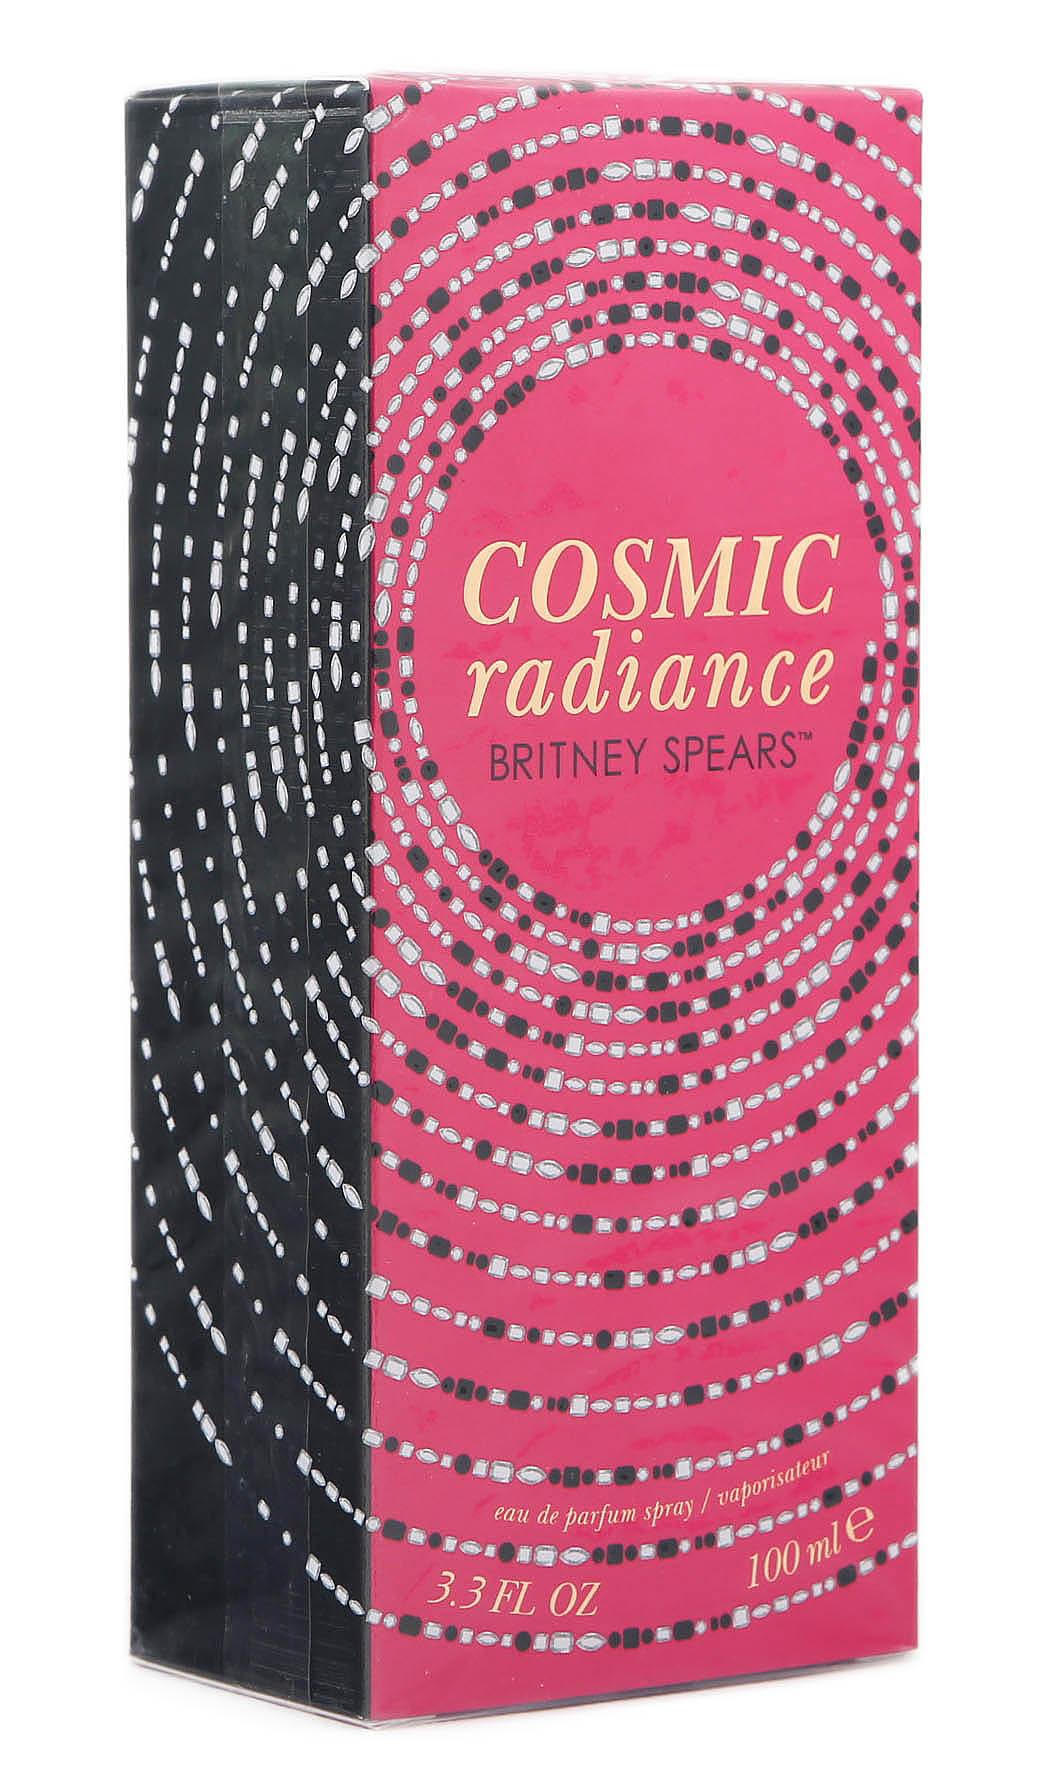 Britney Spears Cosmic Radiance Eau de Parfum